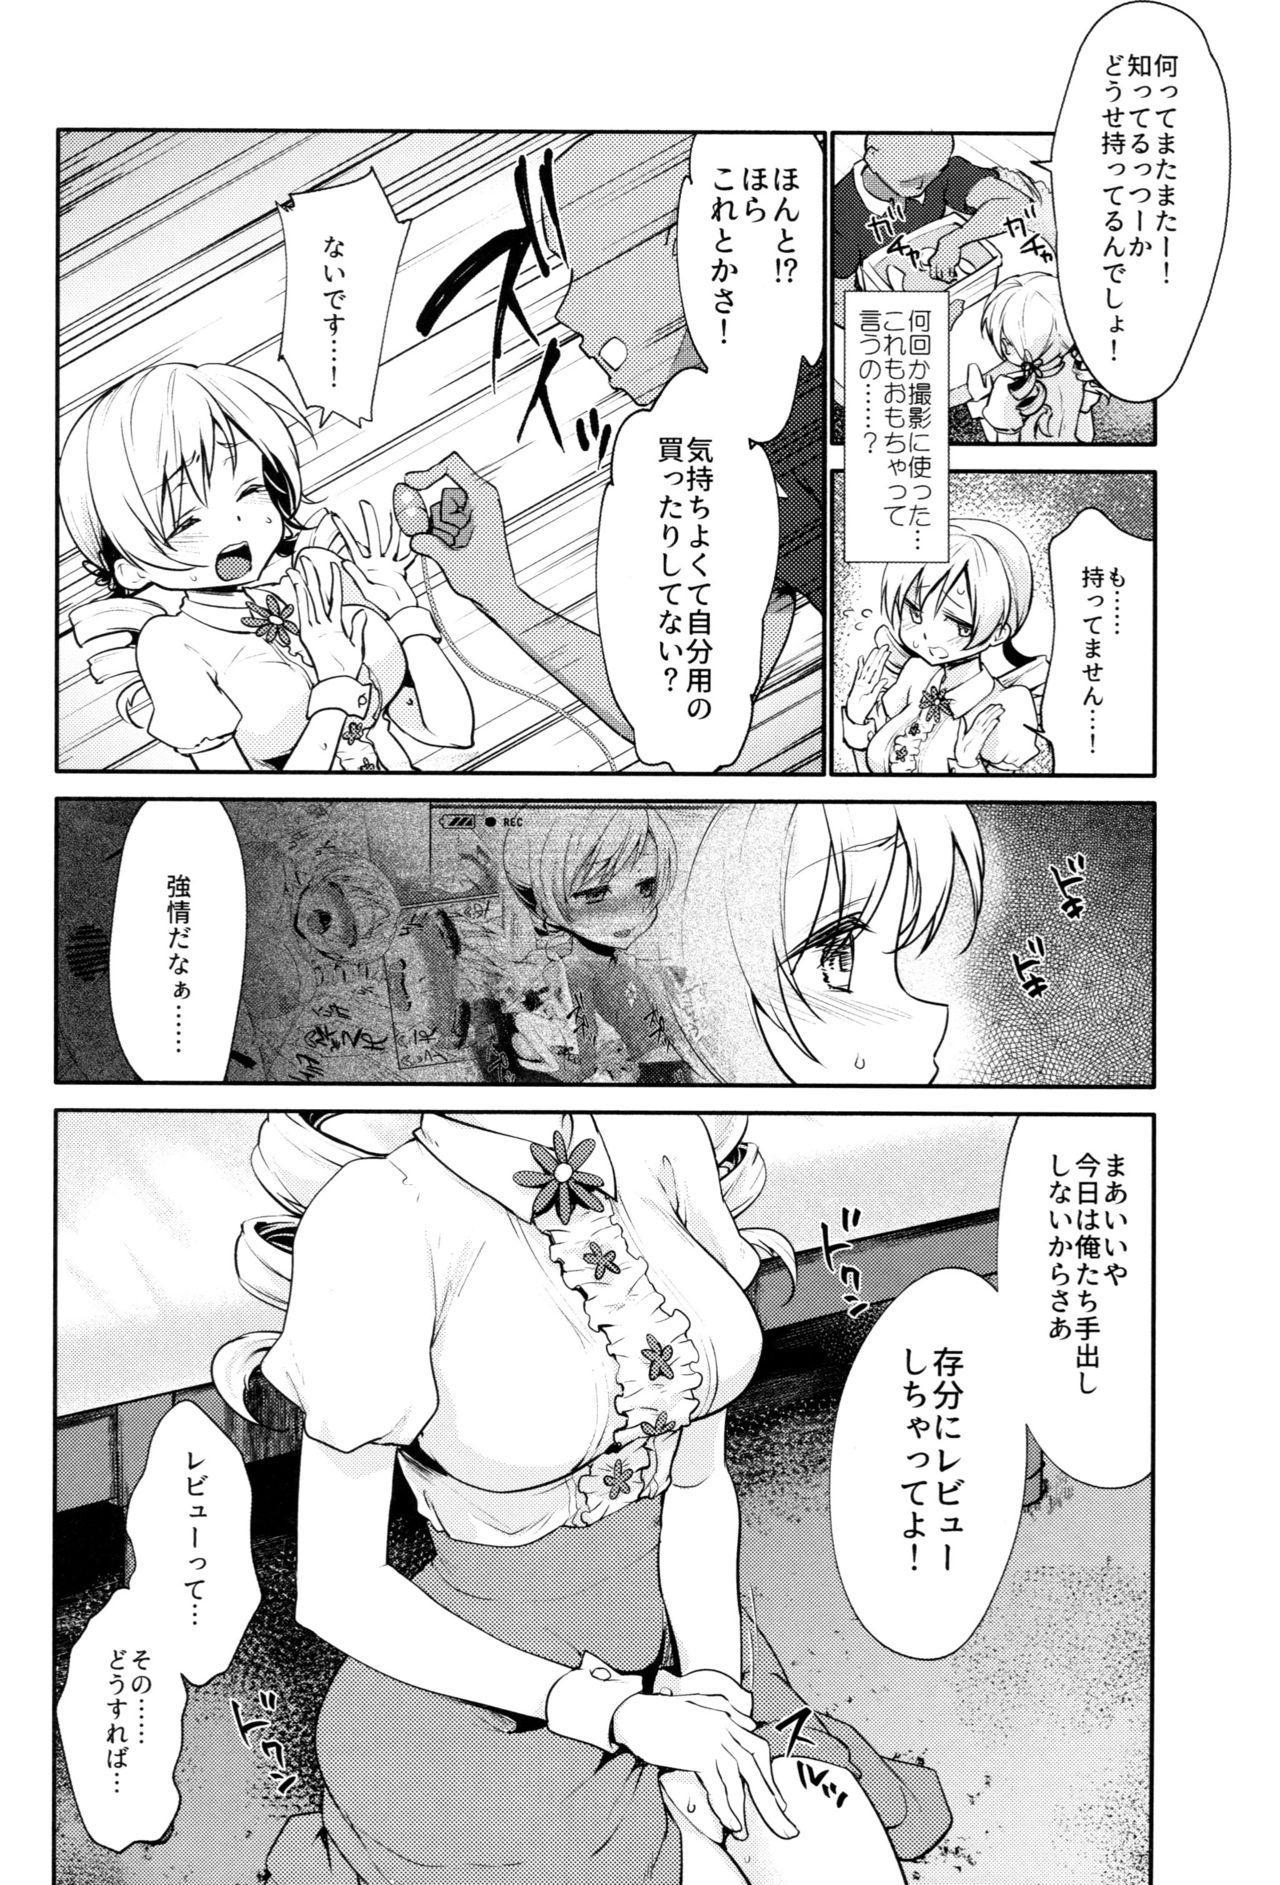 Tomoe Mami no Mankai Omocha Review 5